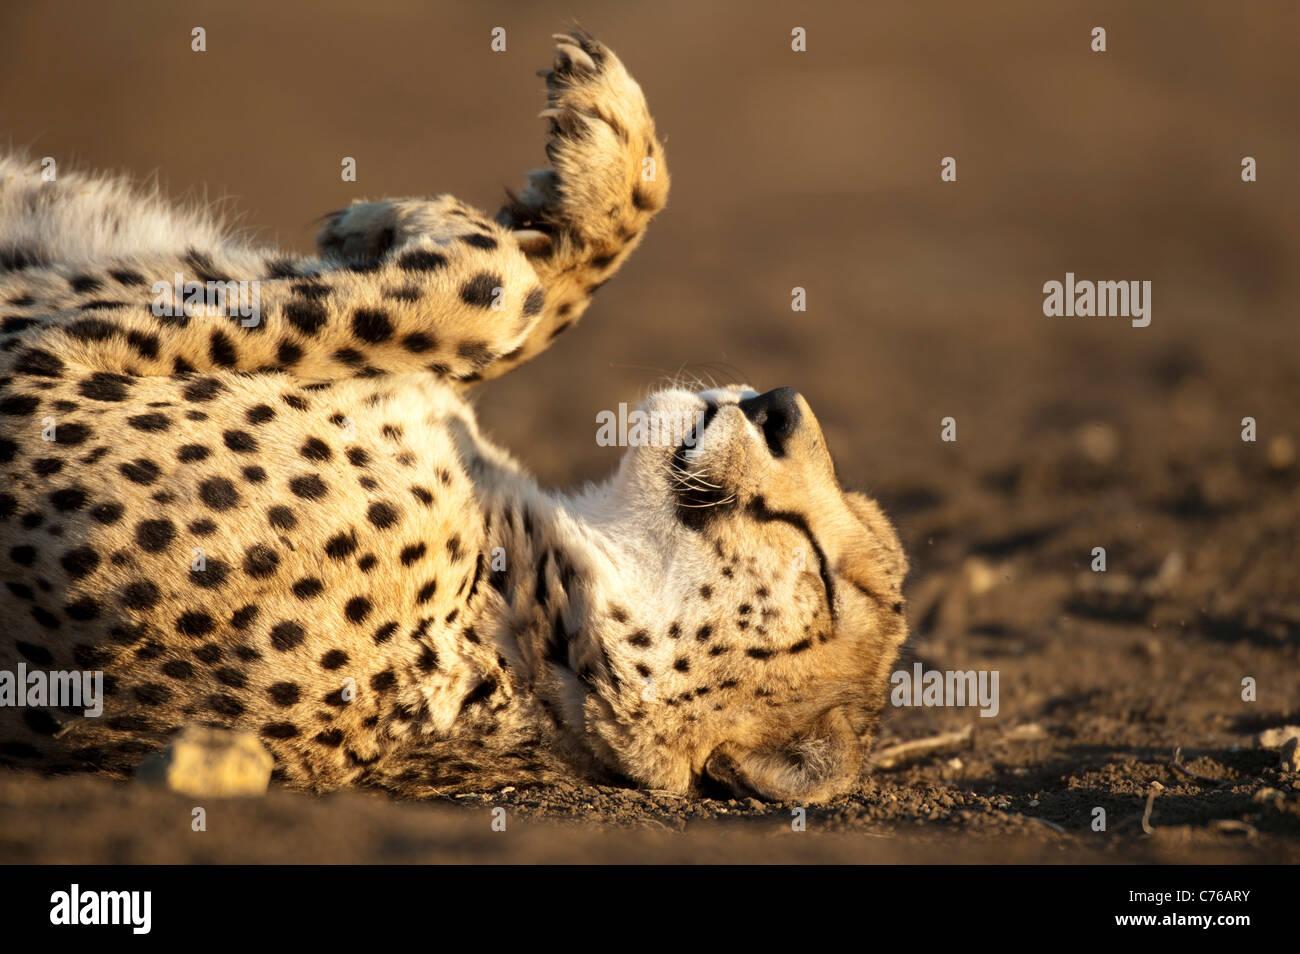 Ghepardo (Acinonyx jubatus), Phinda Game Reserve, Sud Africa Immagini Stock